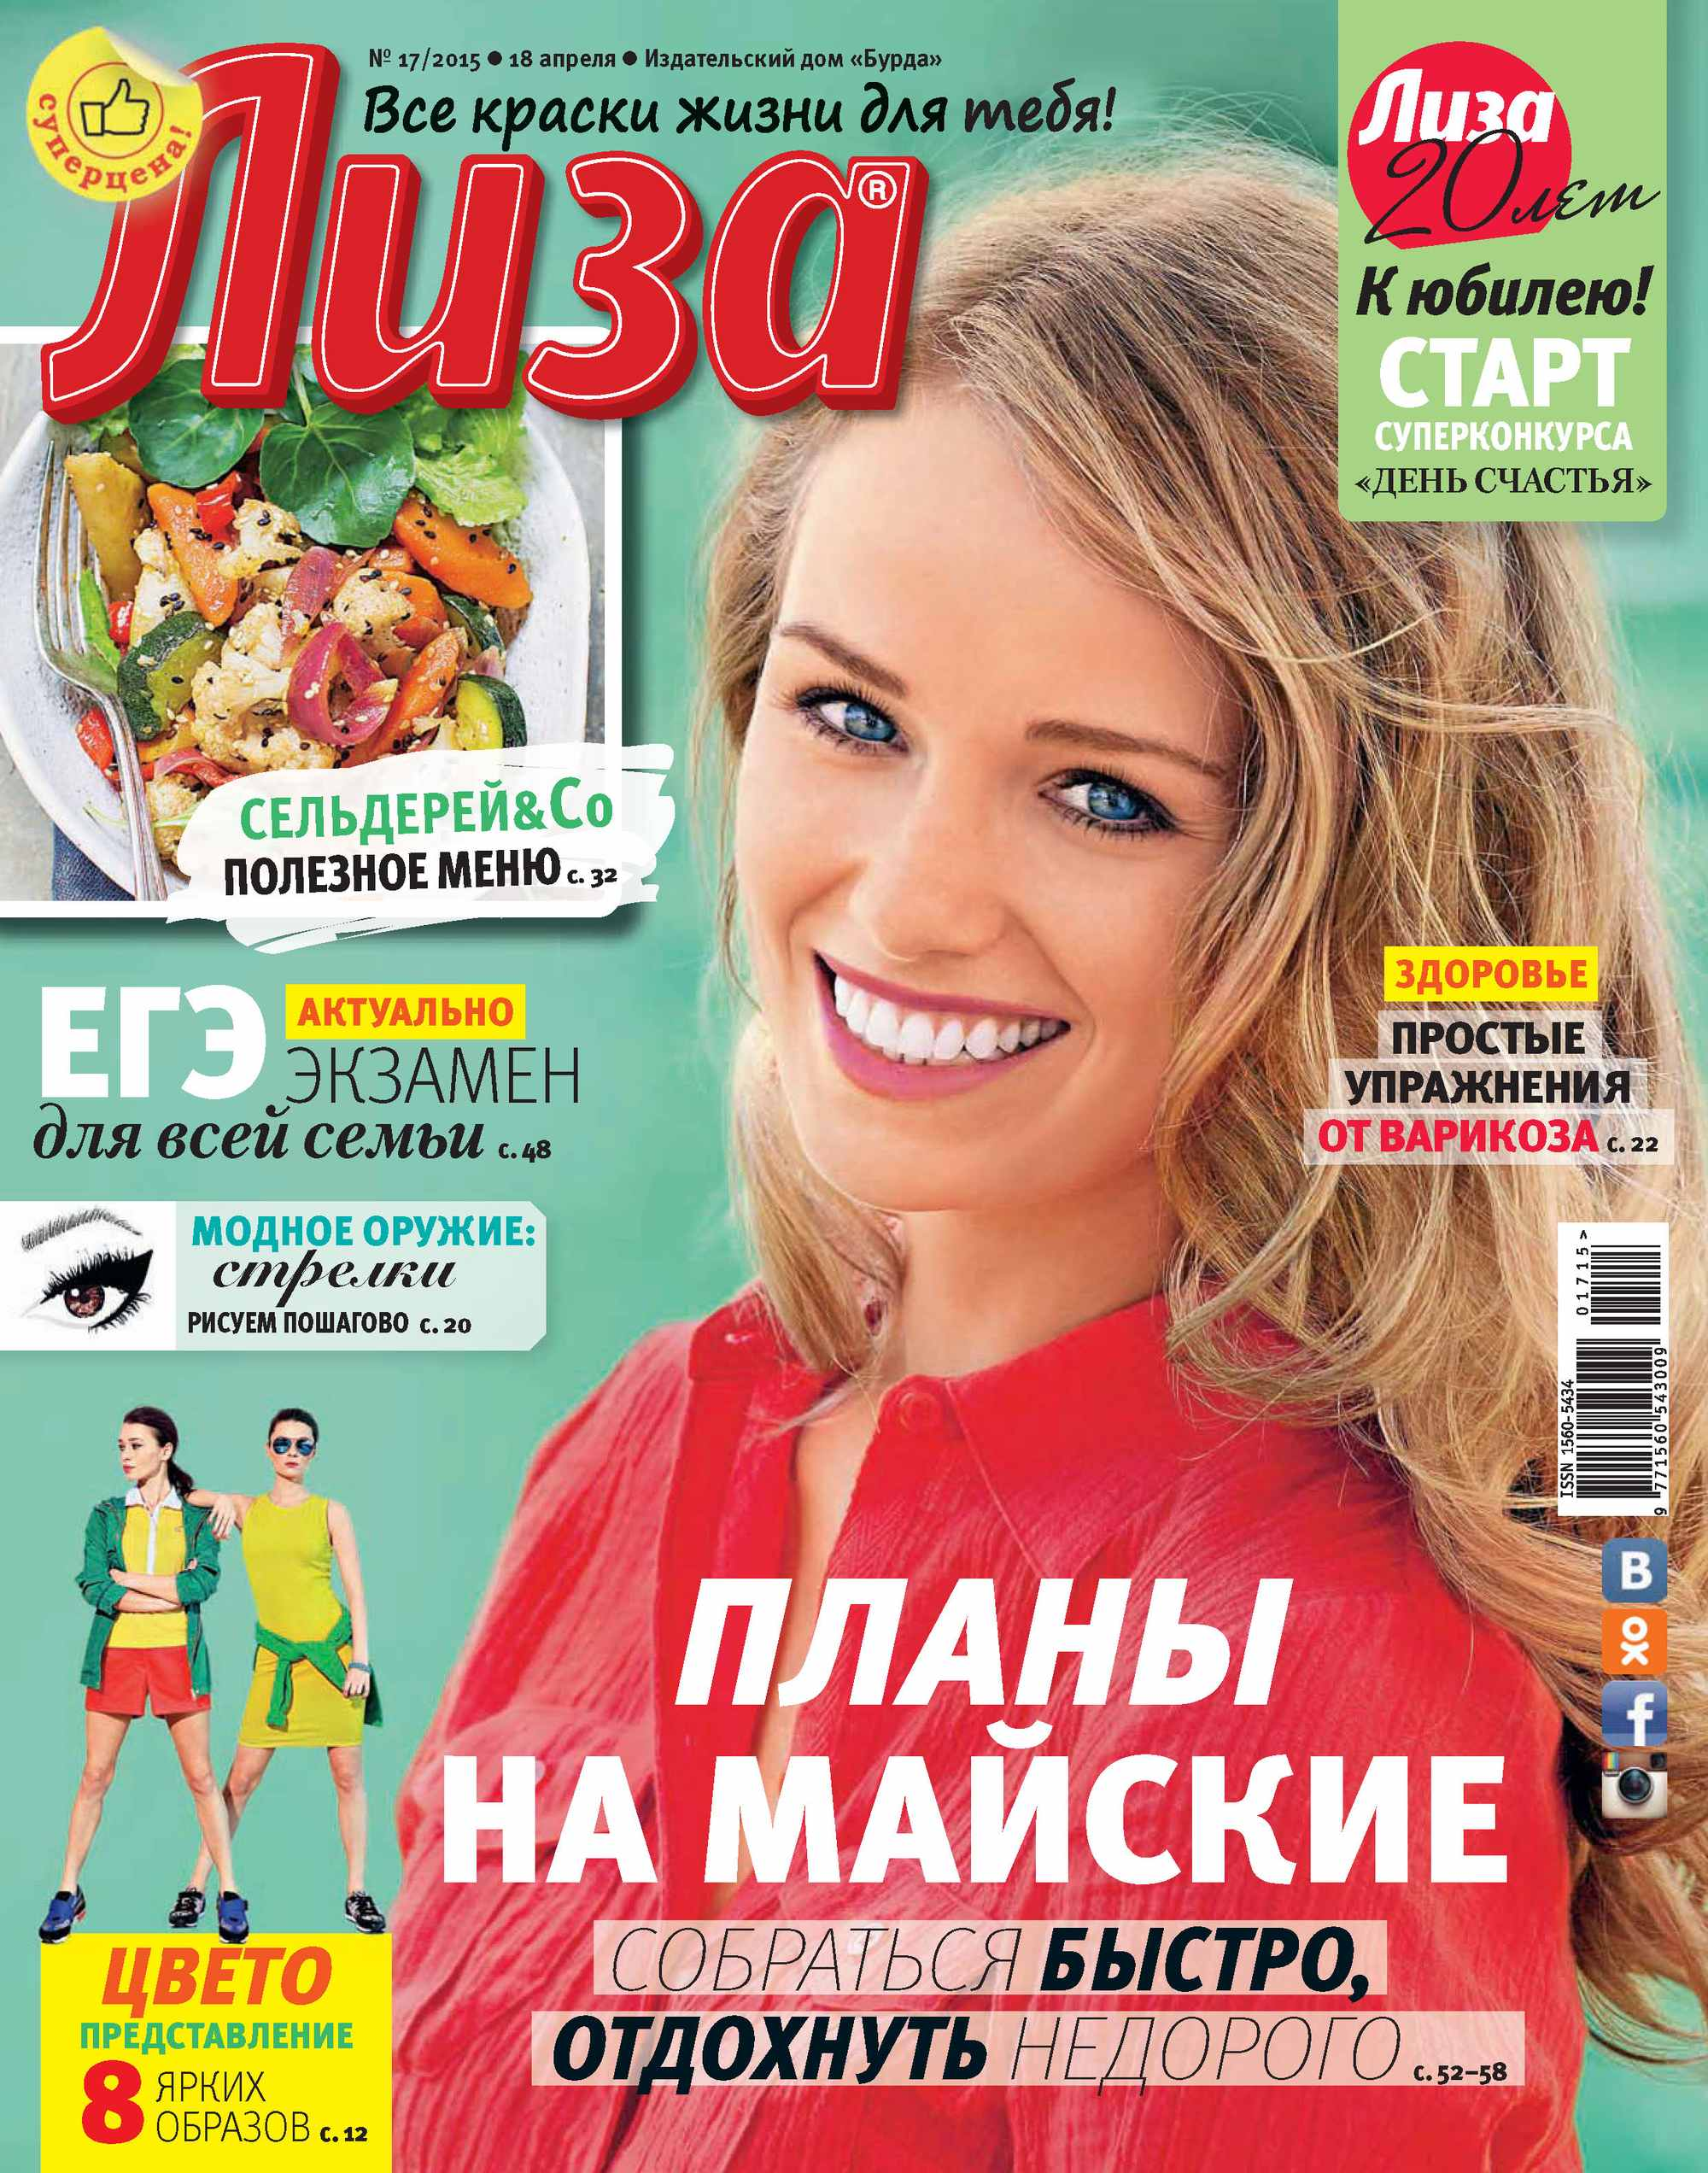 ИД «Бурда» Журнал «Лиза» №17/2015 ид бурда журнал лиза 13 2015